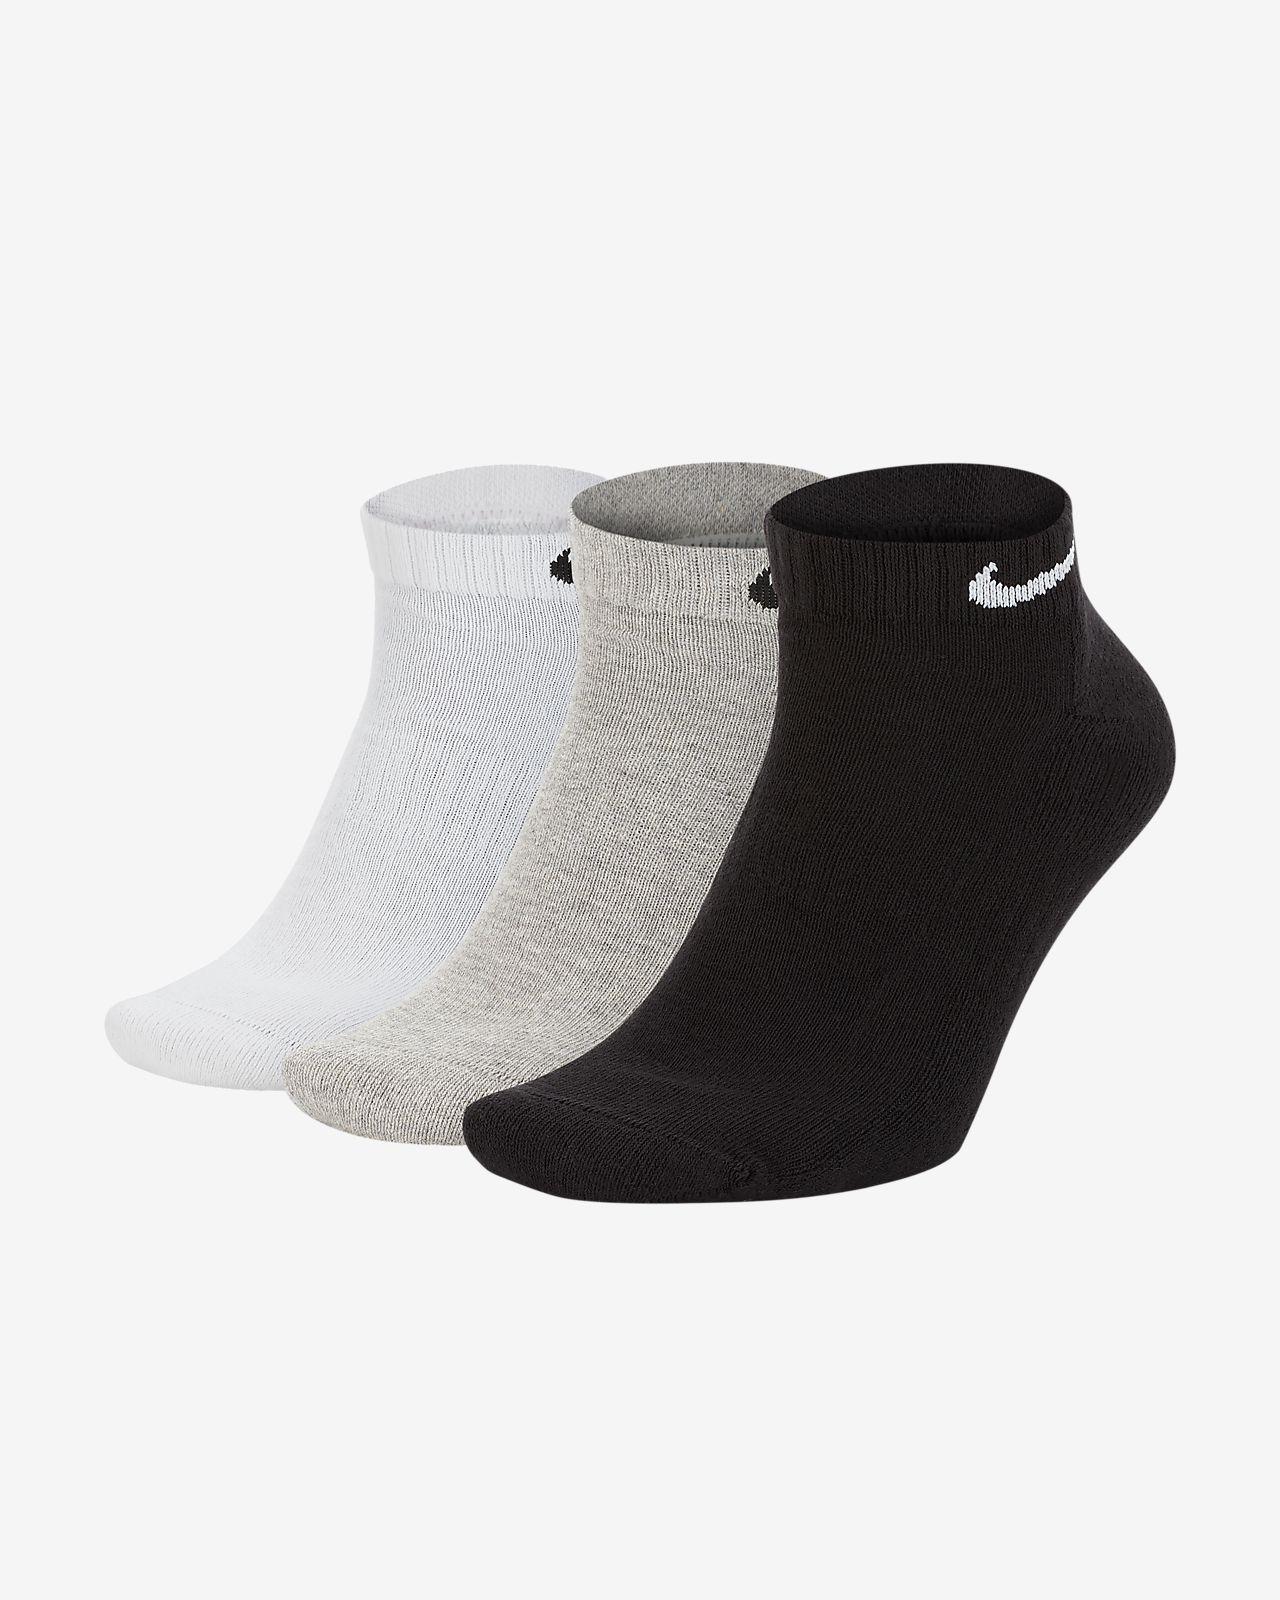 Nike Everyday Cushioned Training Low Socks (3 Pairs)